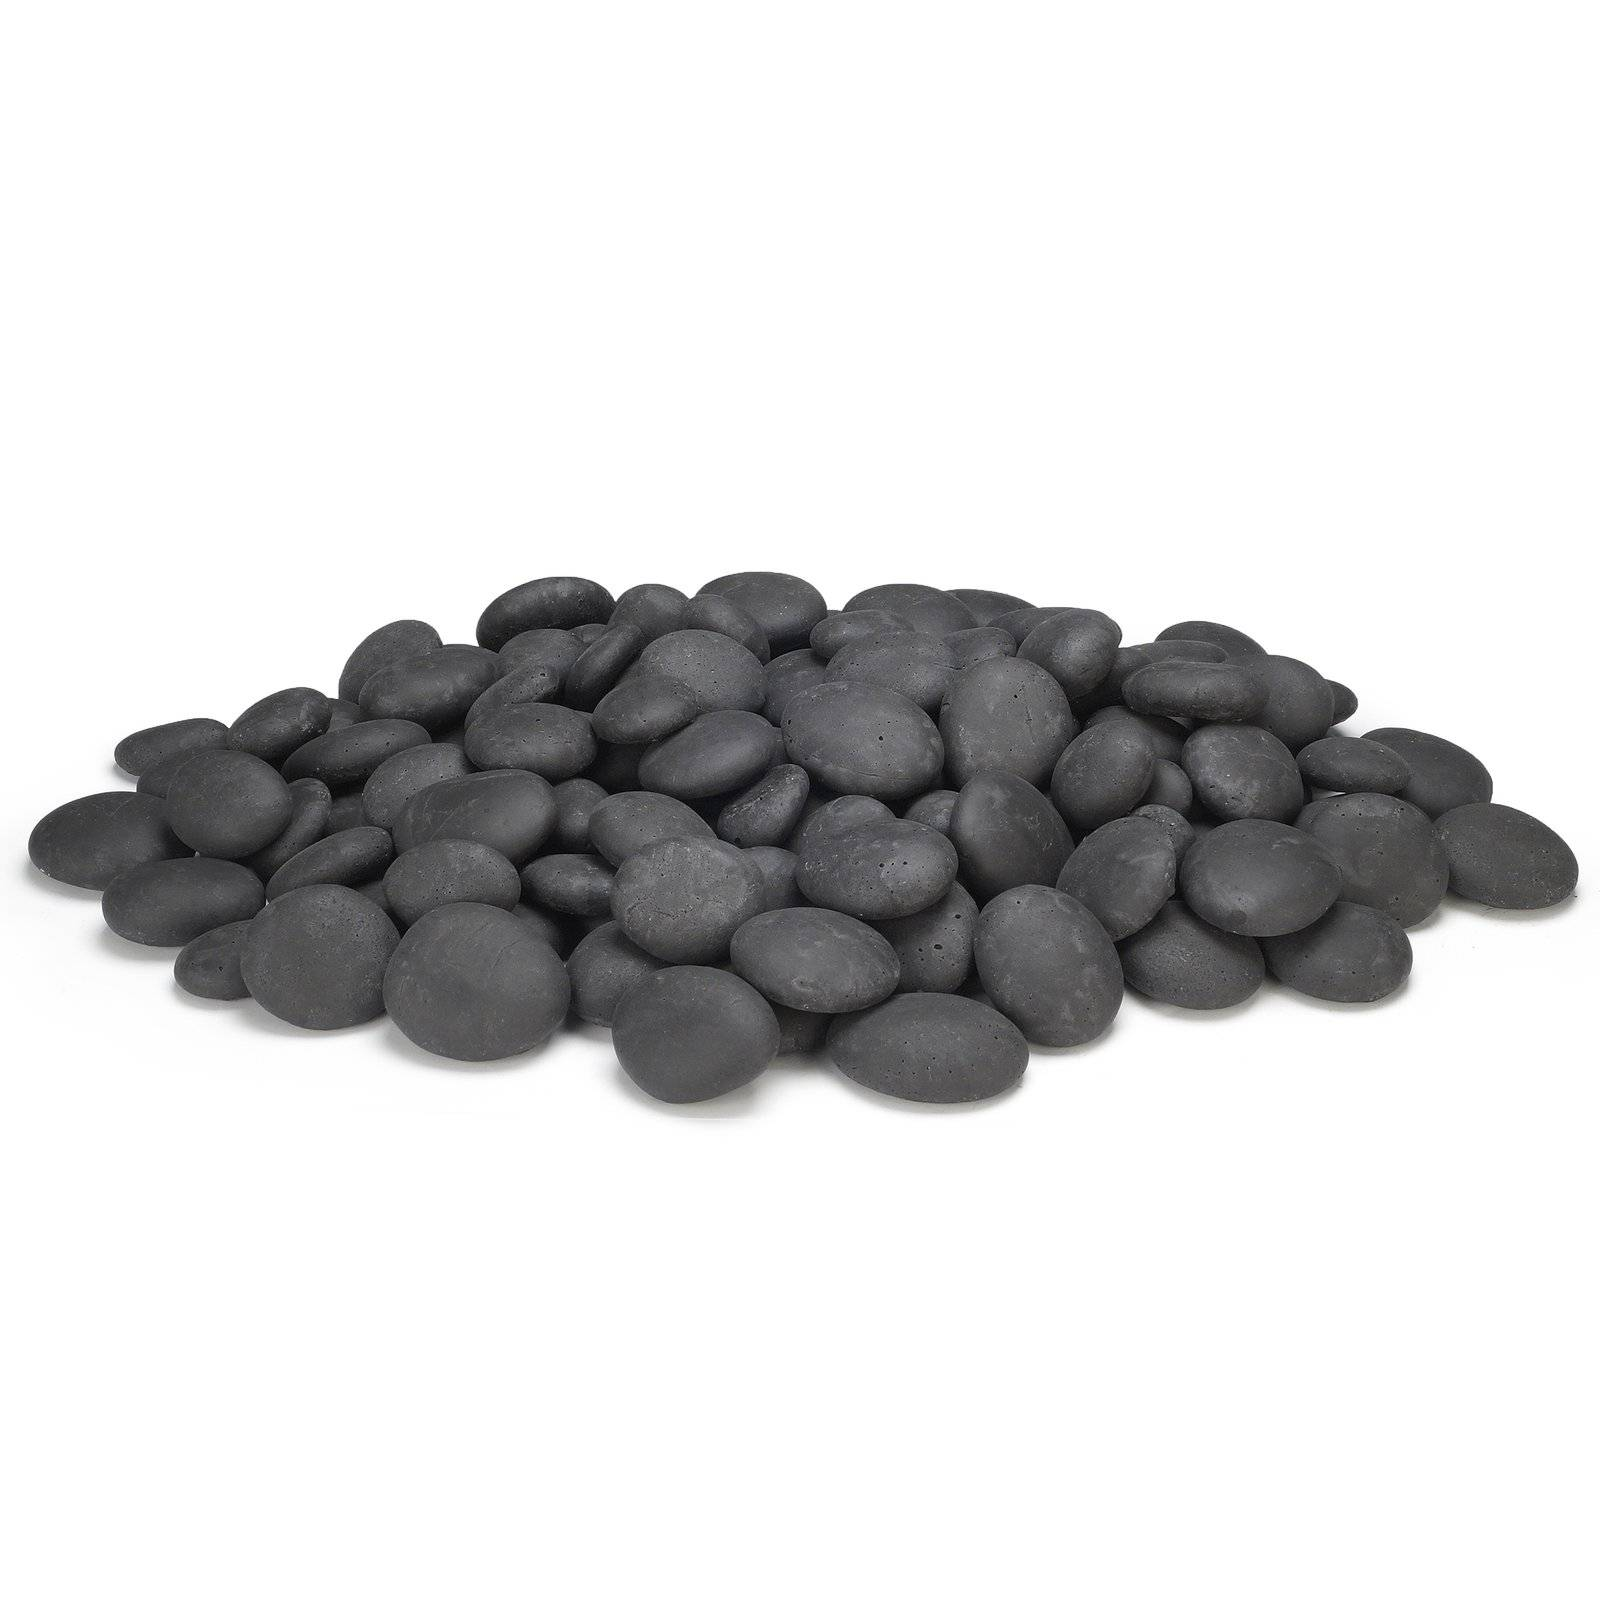 A pile of ceramic river rocks